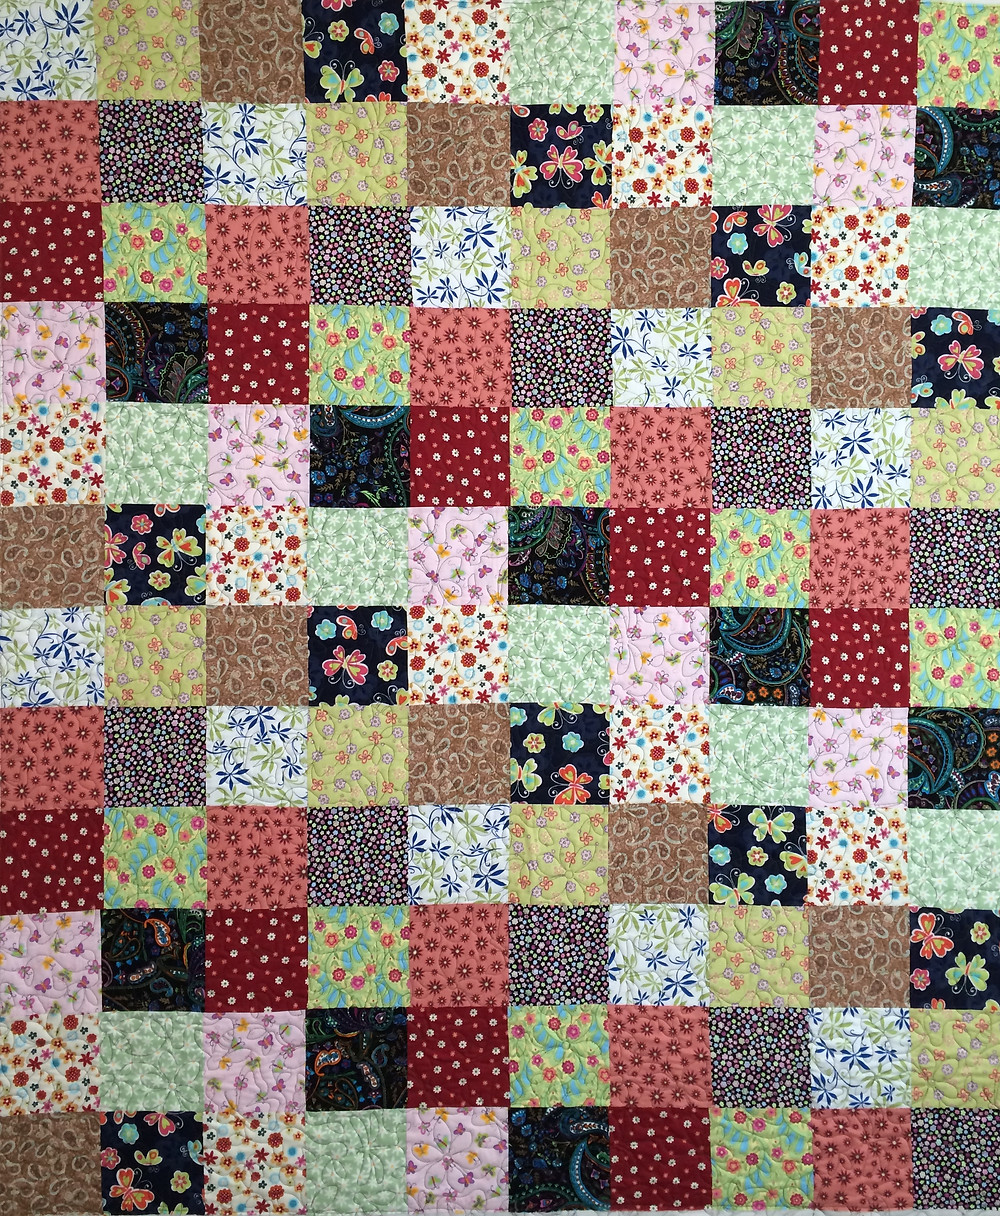 Toni Multi Color Squares Quilt